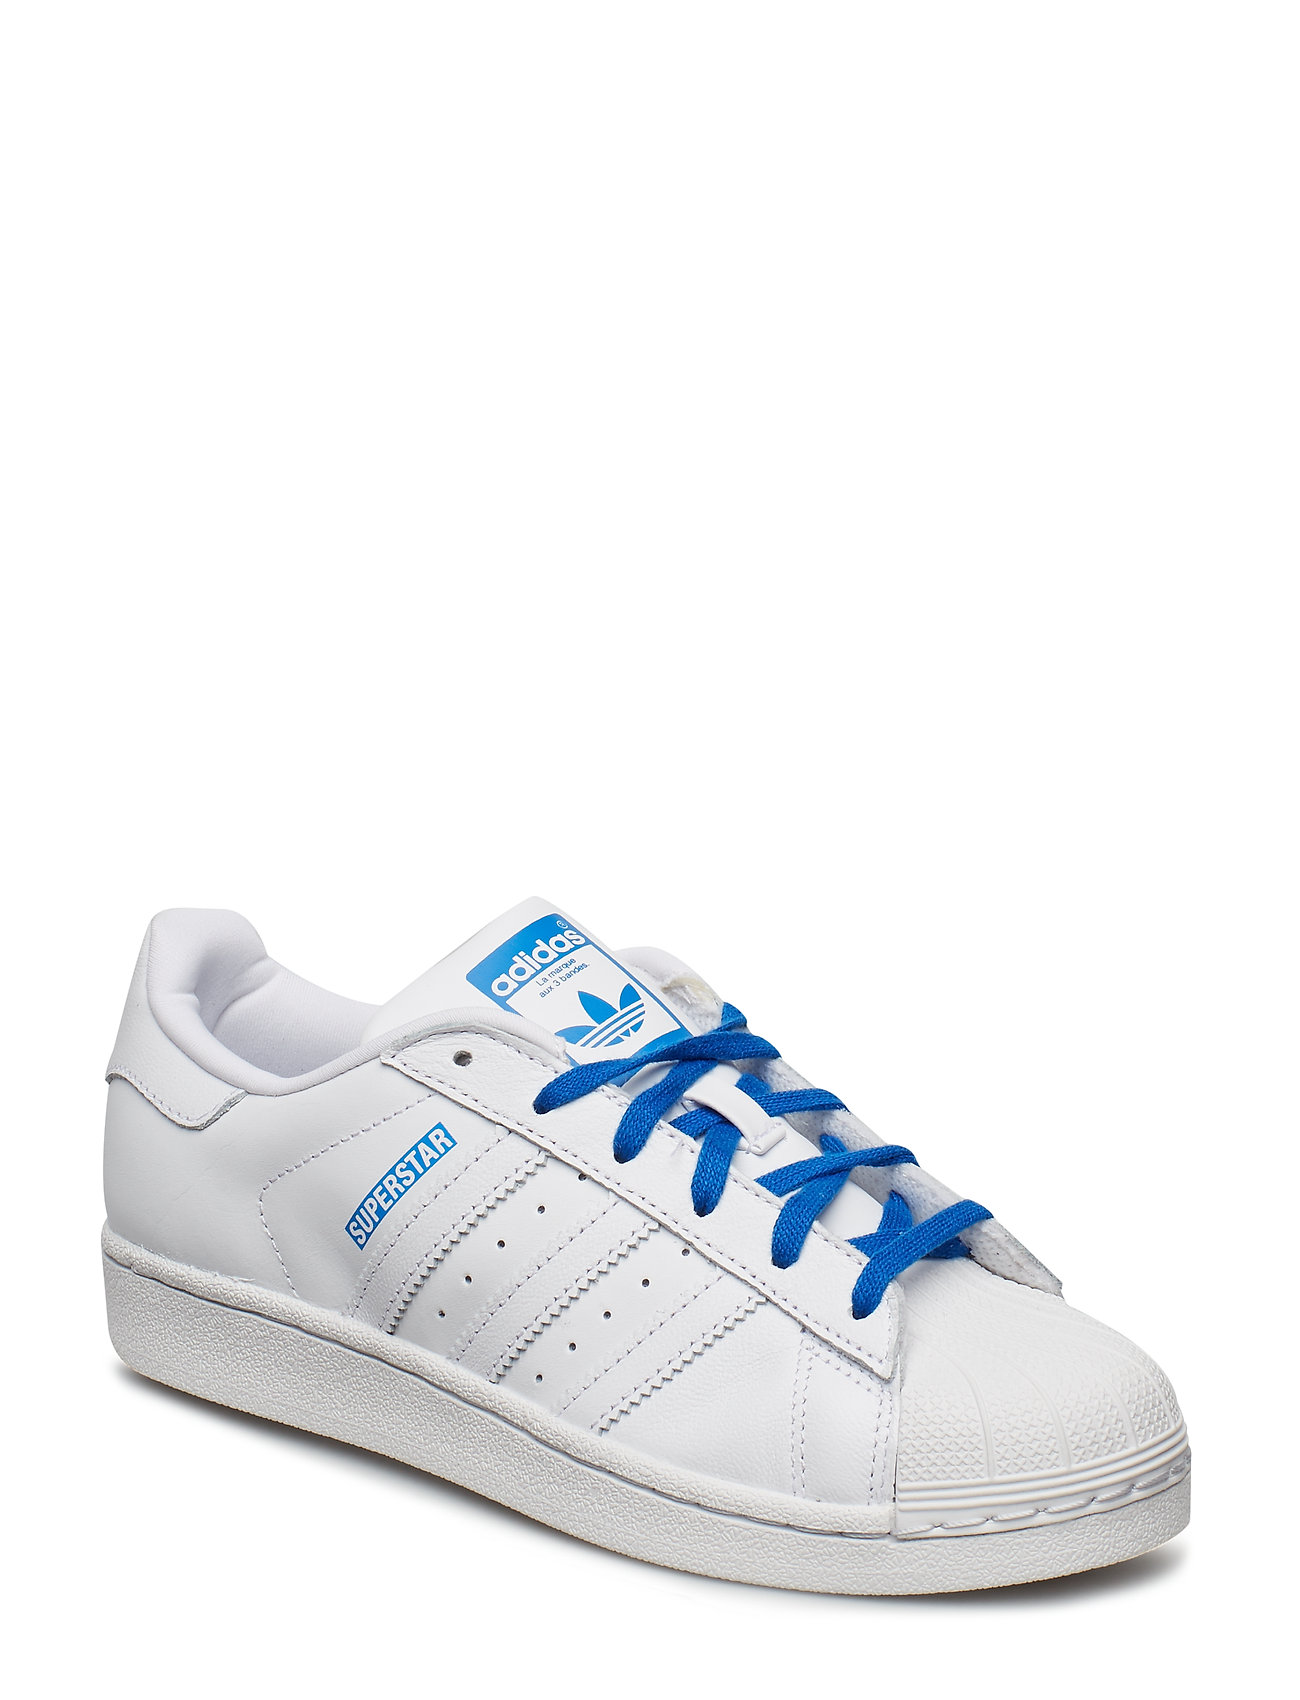 adidas Originals SUPERSTAR J - FTWWHT/FTWWHT/BLUE